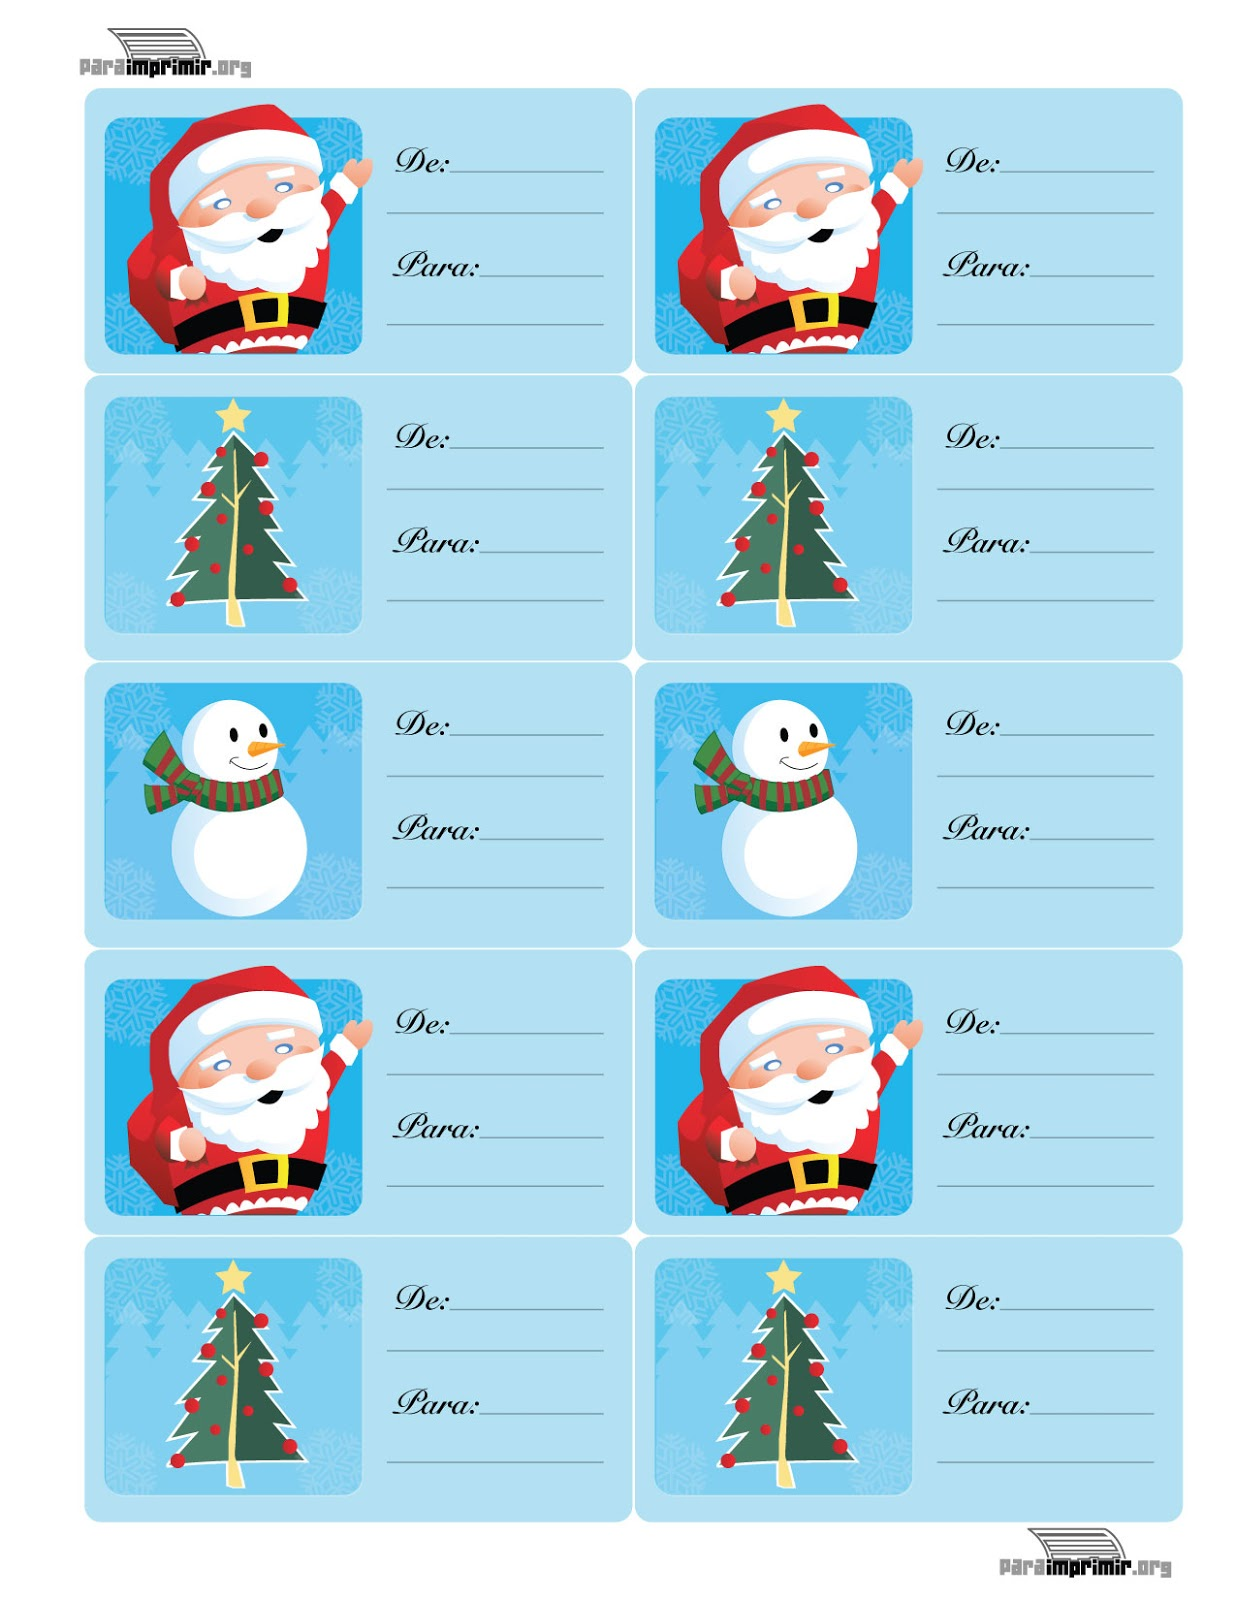 Imagenes Navideas Gratis Para Imprimir. Tarjetas De Navidad Para ...